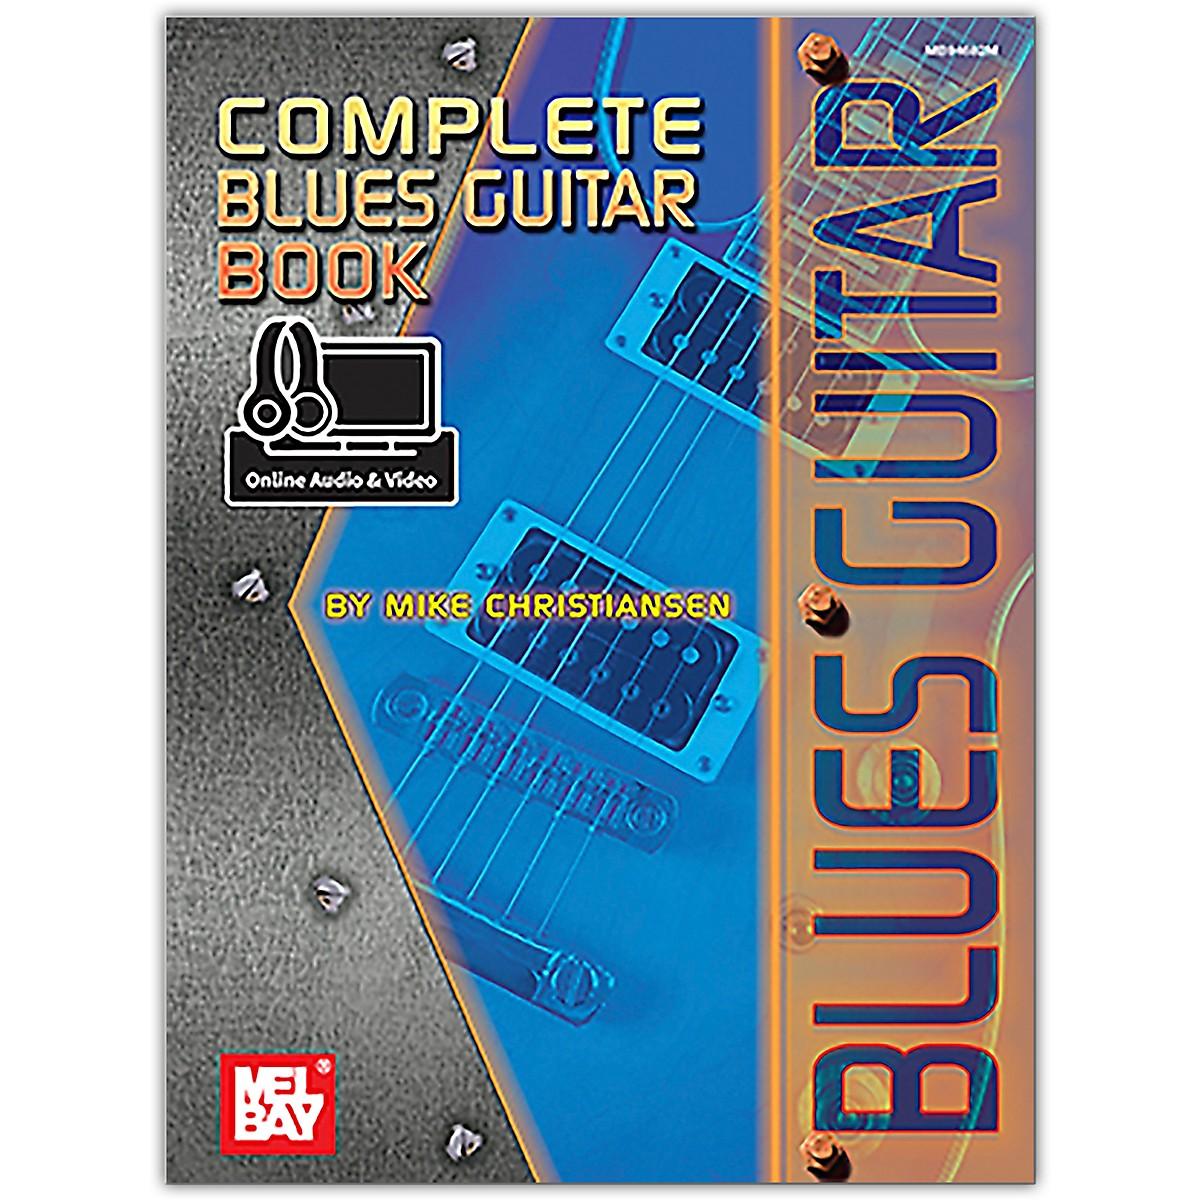 Mel Bay Complete Blues Guitar Book (Book + Online Audio/Video)